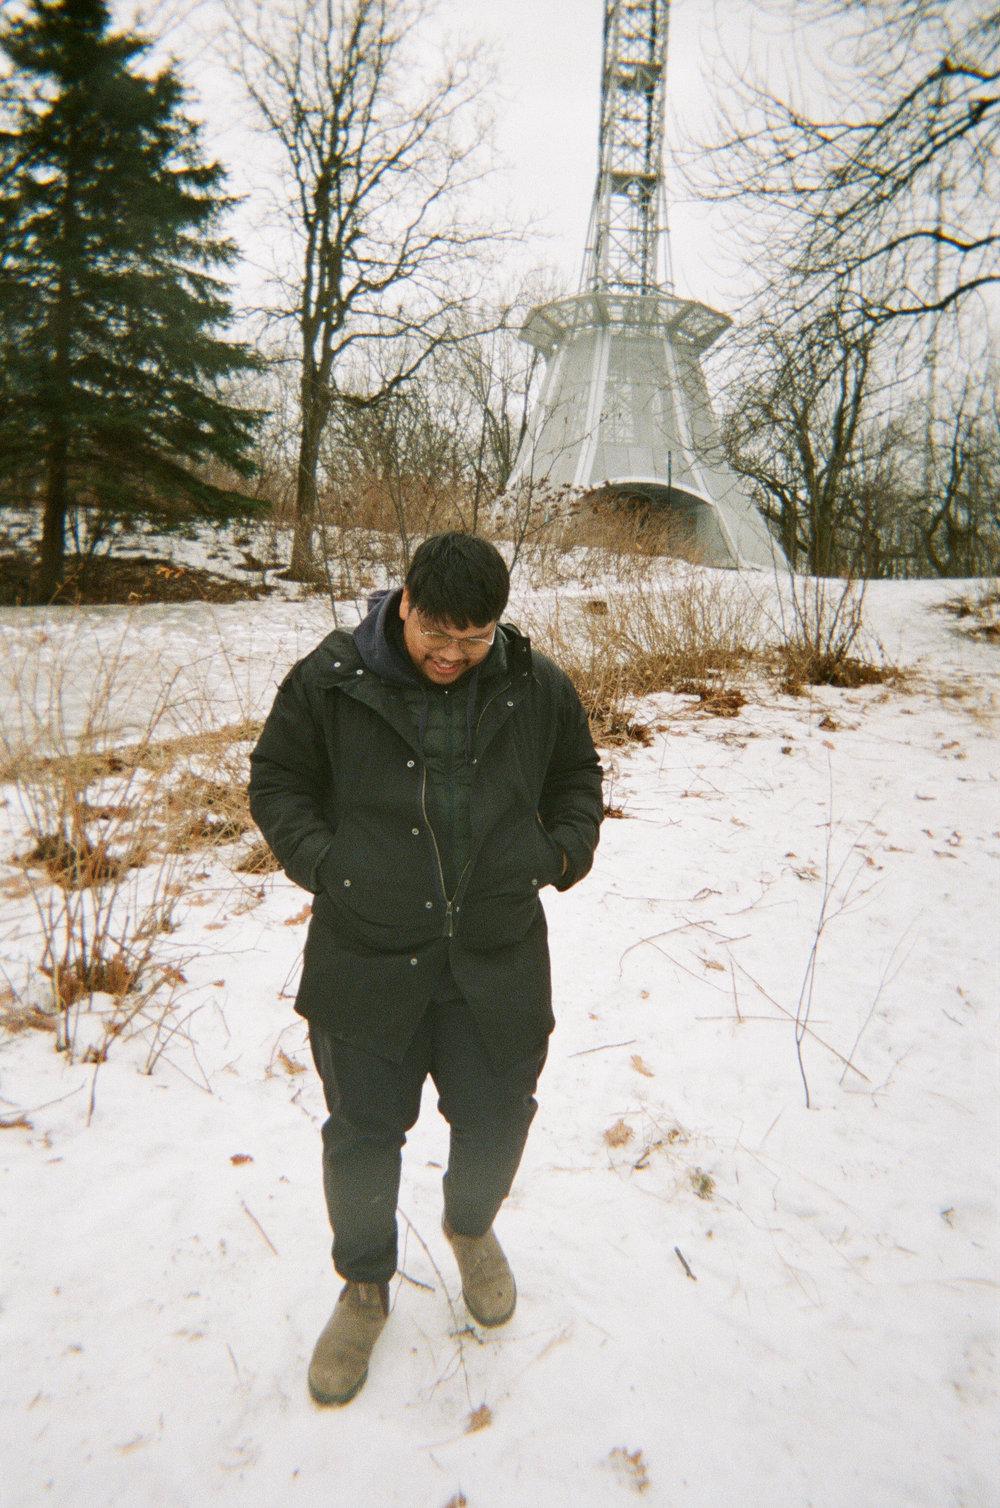 Andrew at Mount Royal Cross - Kodak Funsaver